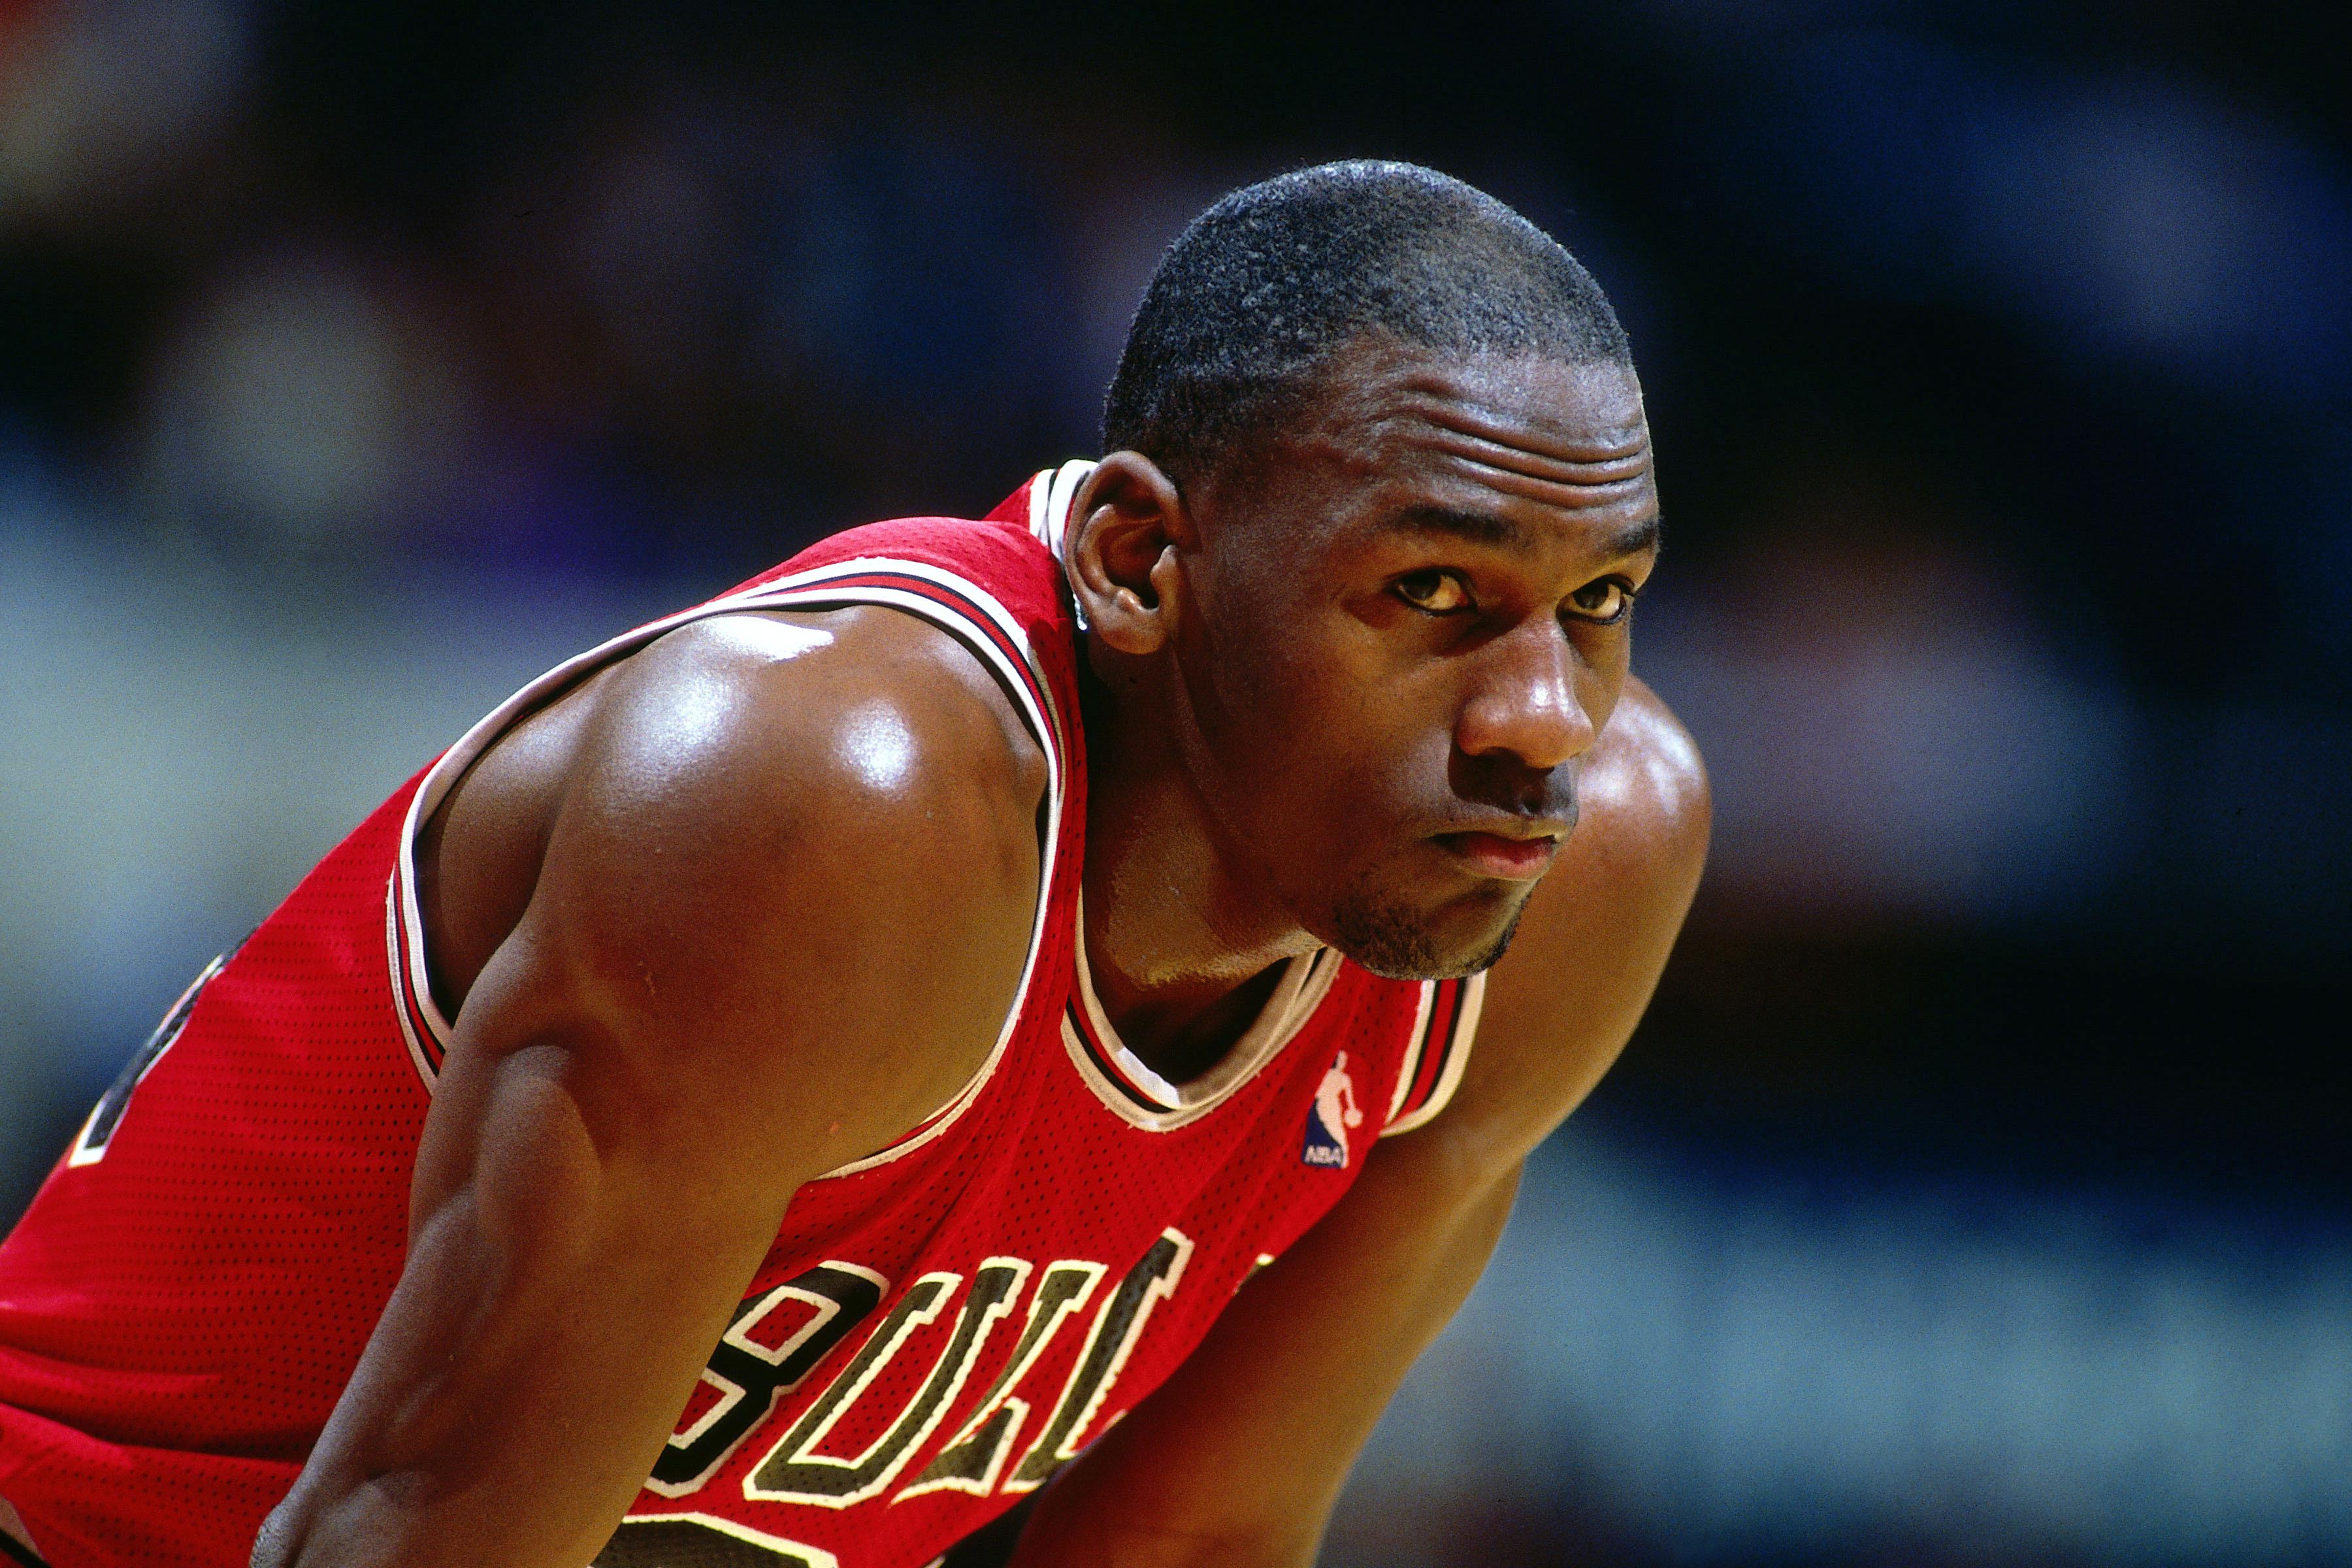 Michael Jordan Wallpapers Images Photos Pictures Backgrounds